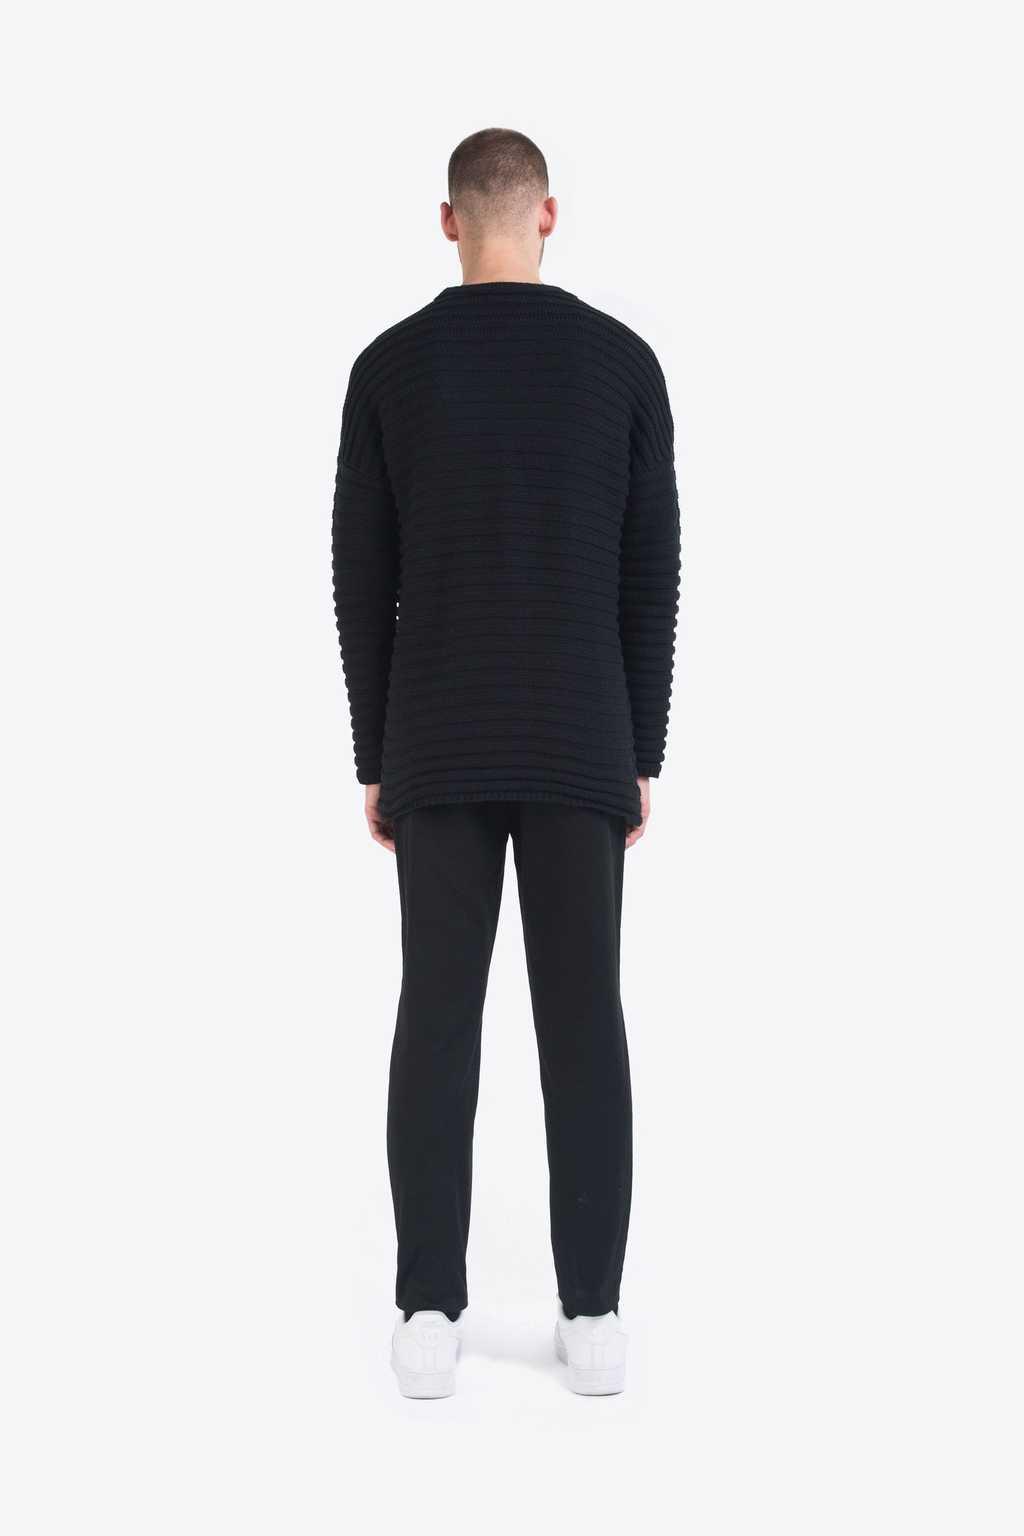 Sweater 7226 Black 8